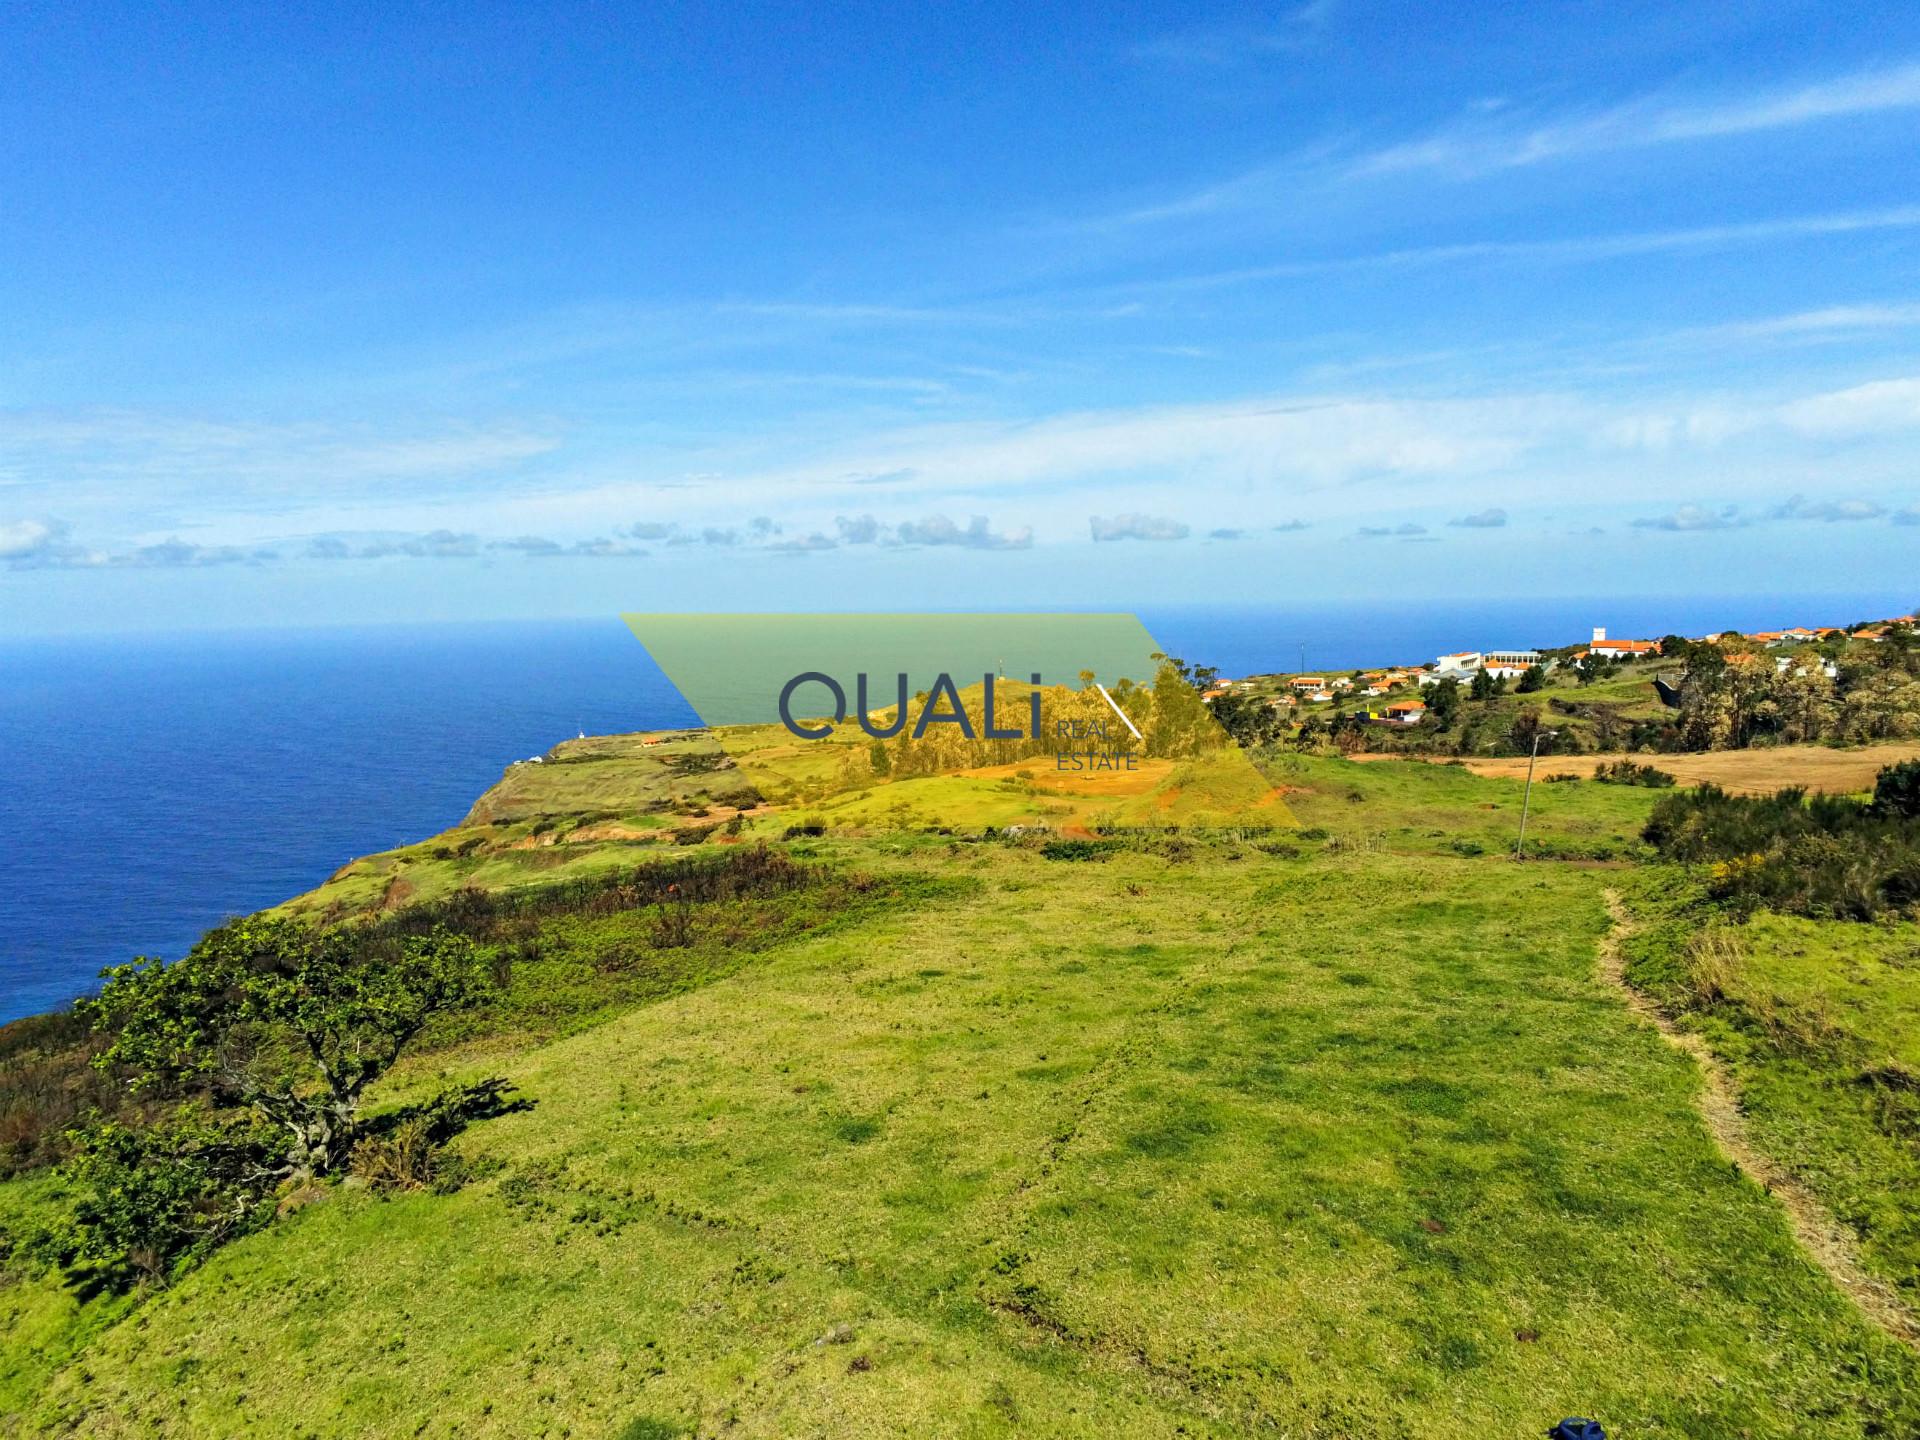 Excelente terreno para turismo - Ilha da Madeira - €450.000,00